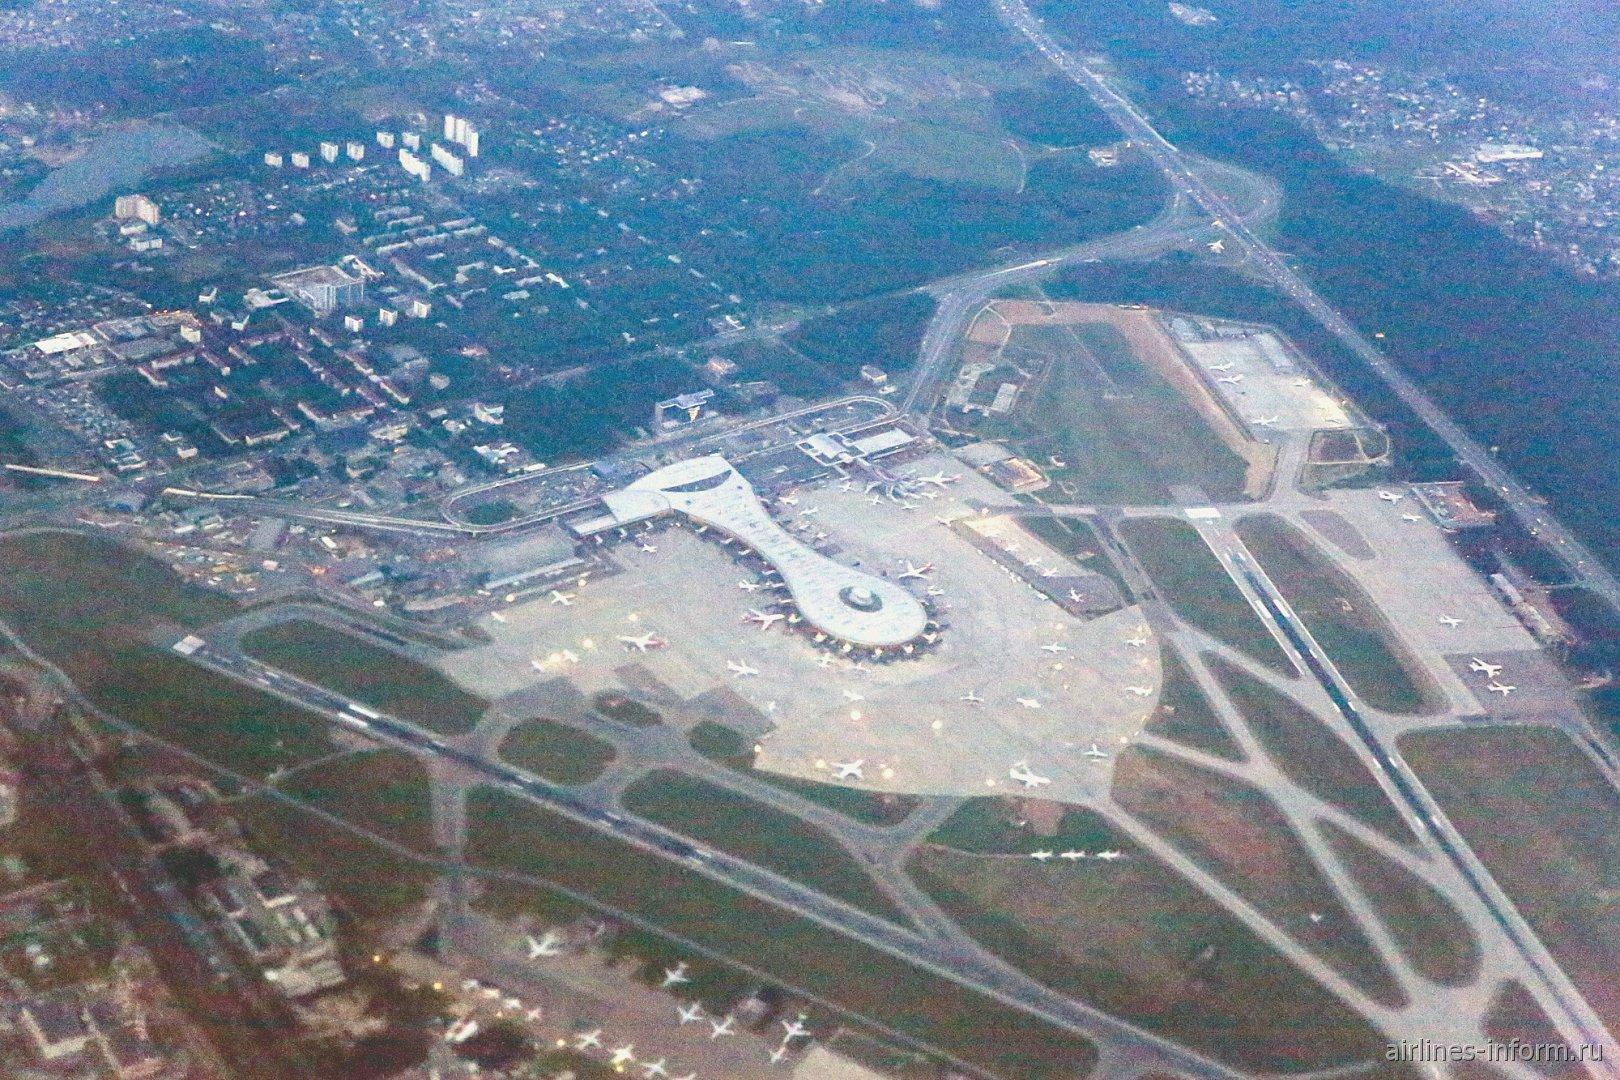 Вид сверху на аэропорт Москва Внуково